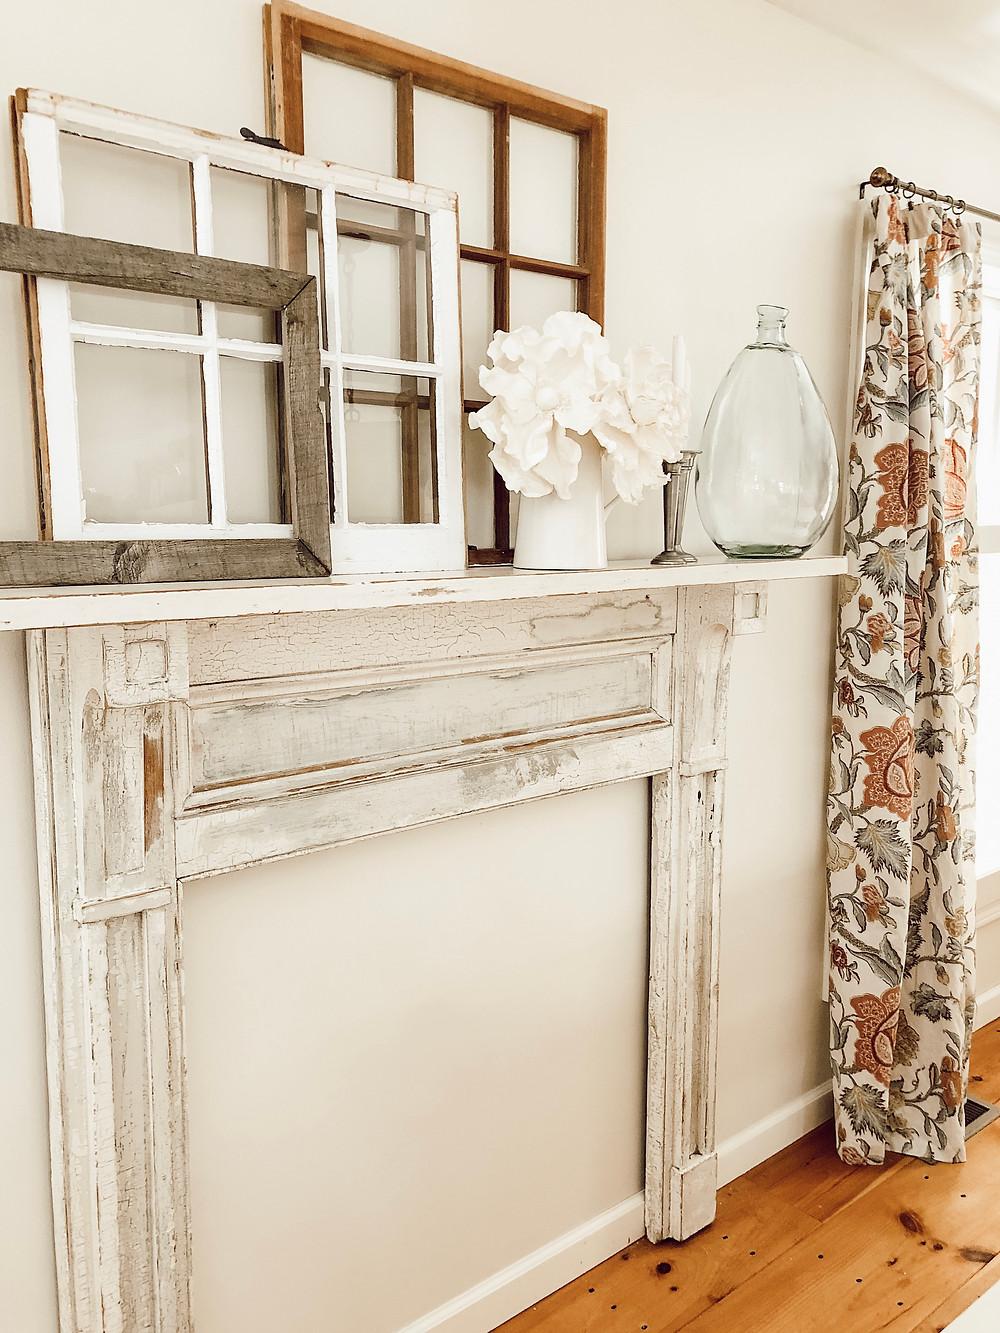 Vintage Fireplace Mantel Install & Decorating Ideas